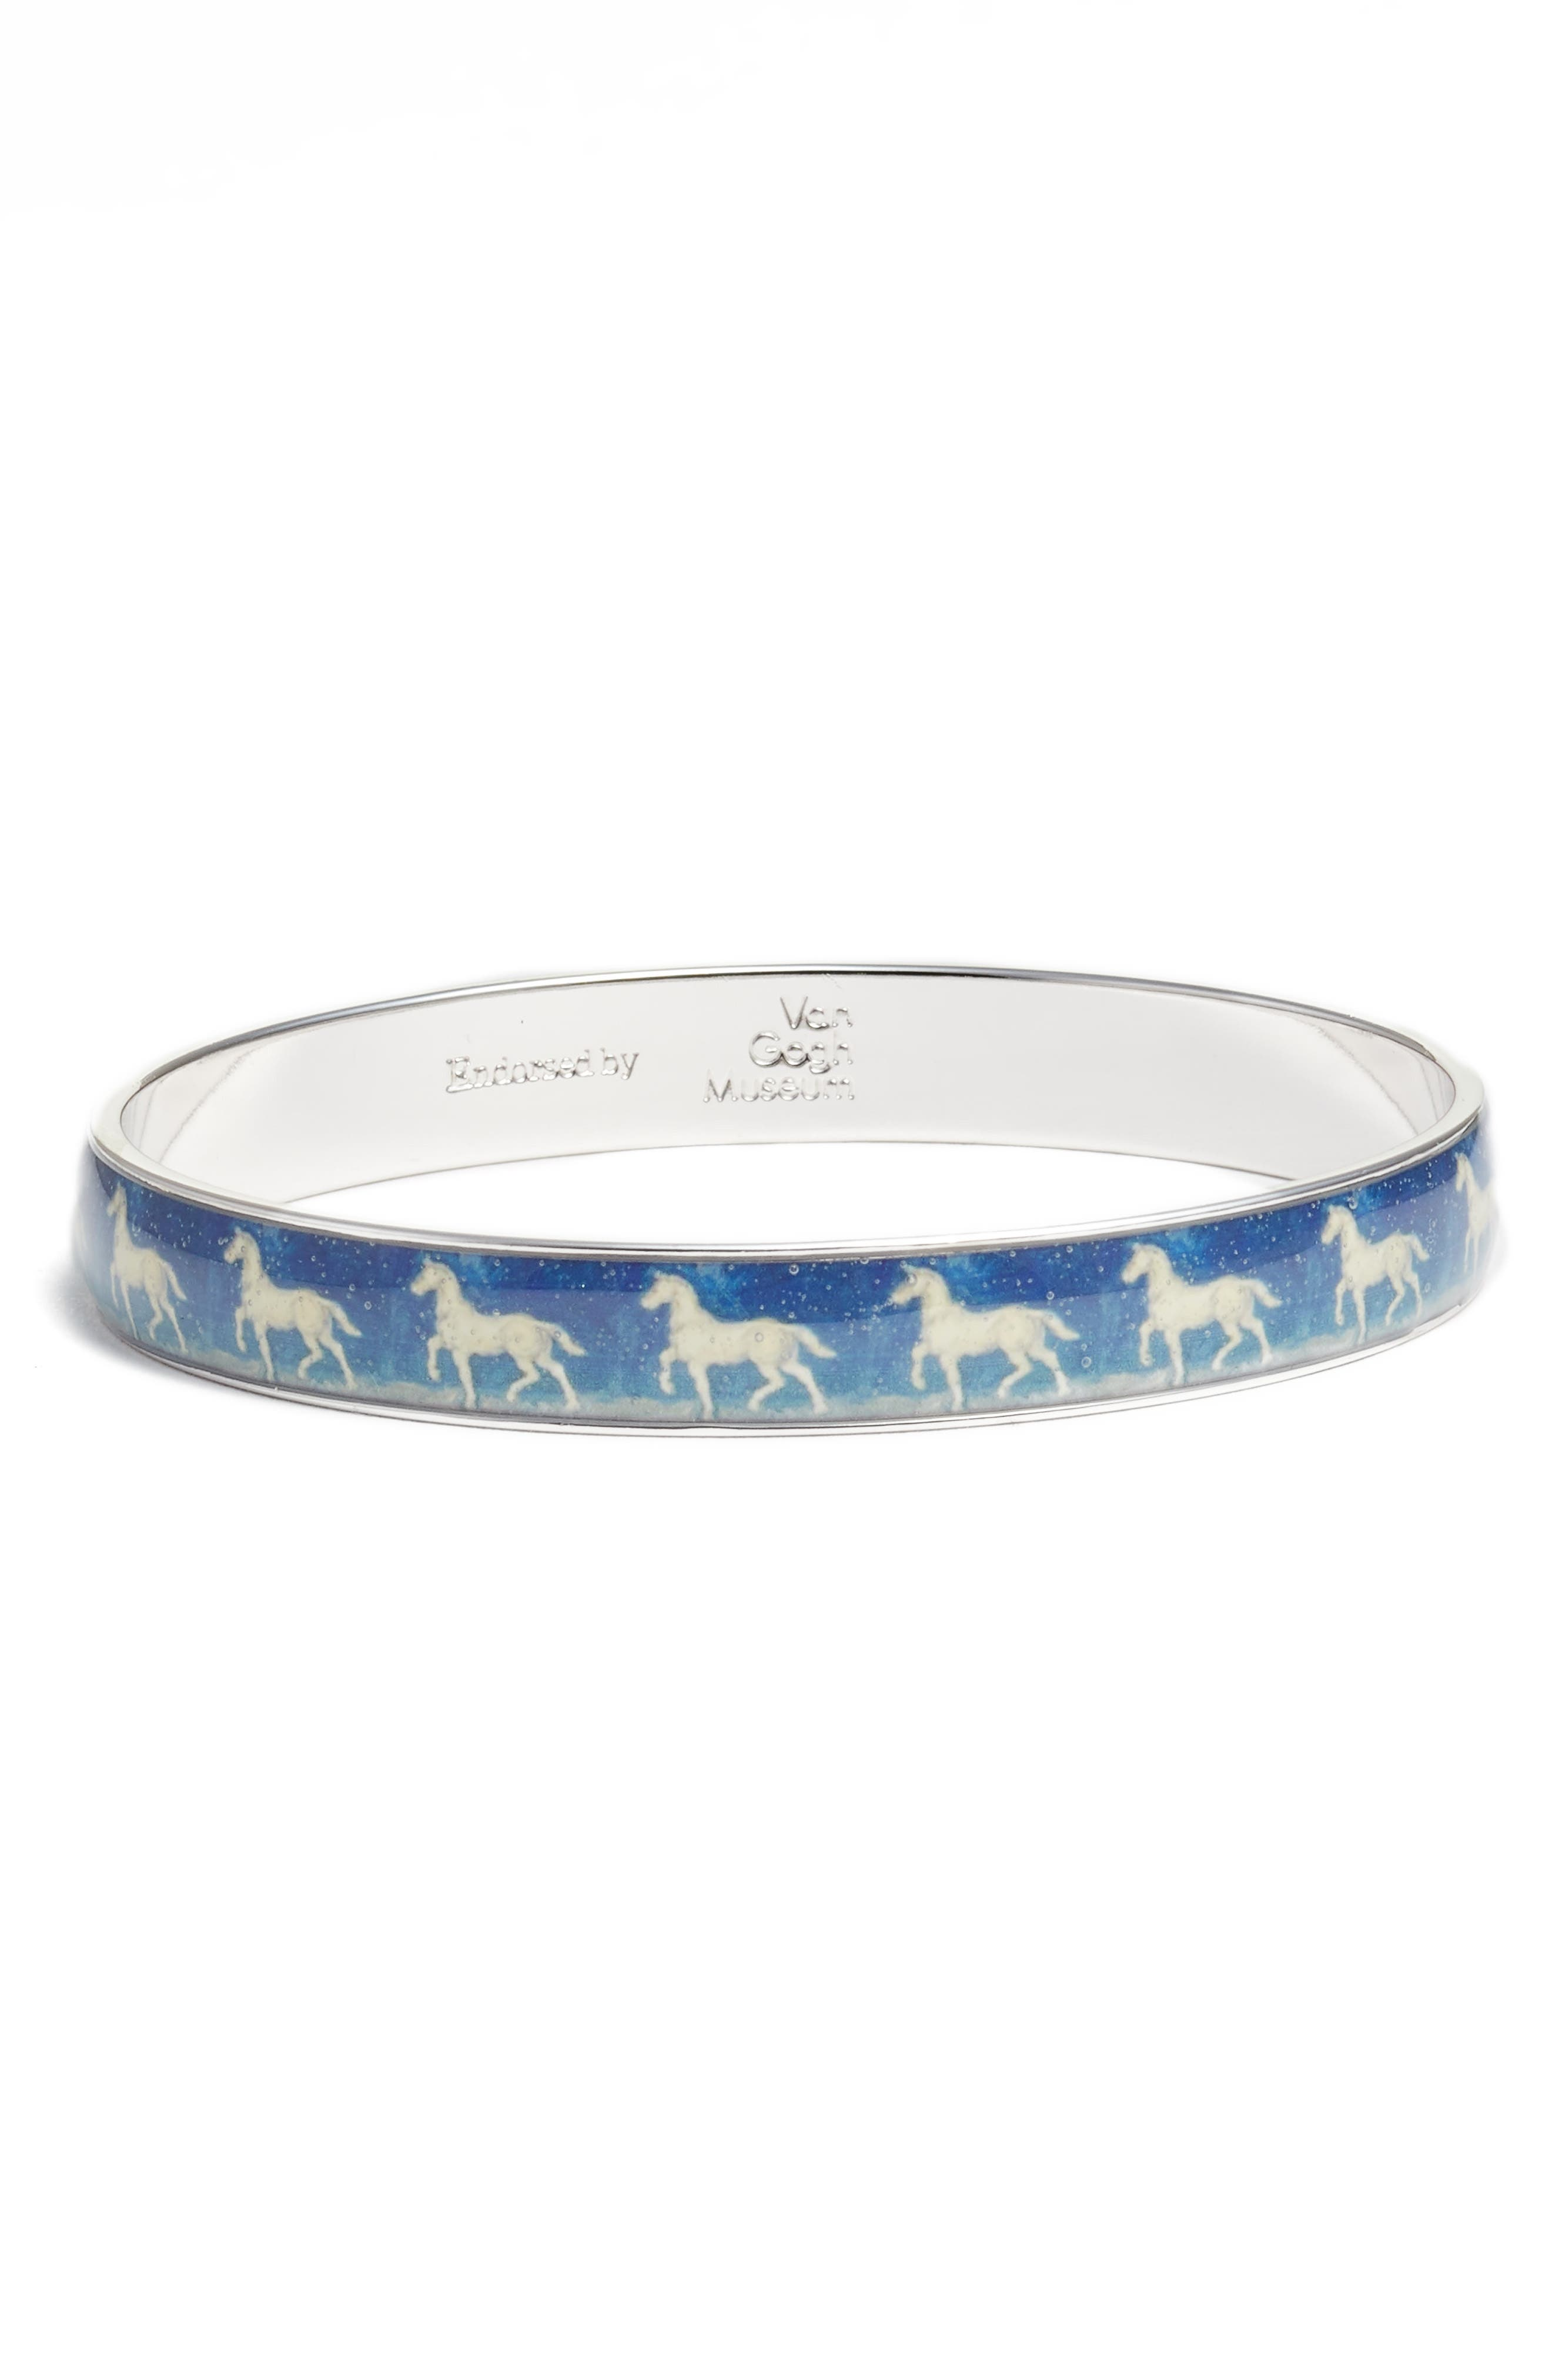 Blue Horse Medium Bracelet,                             Main thumbnail 1, color,                             BLUE/ SILVER